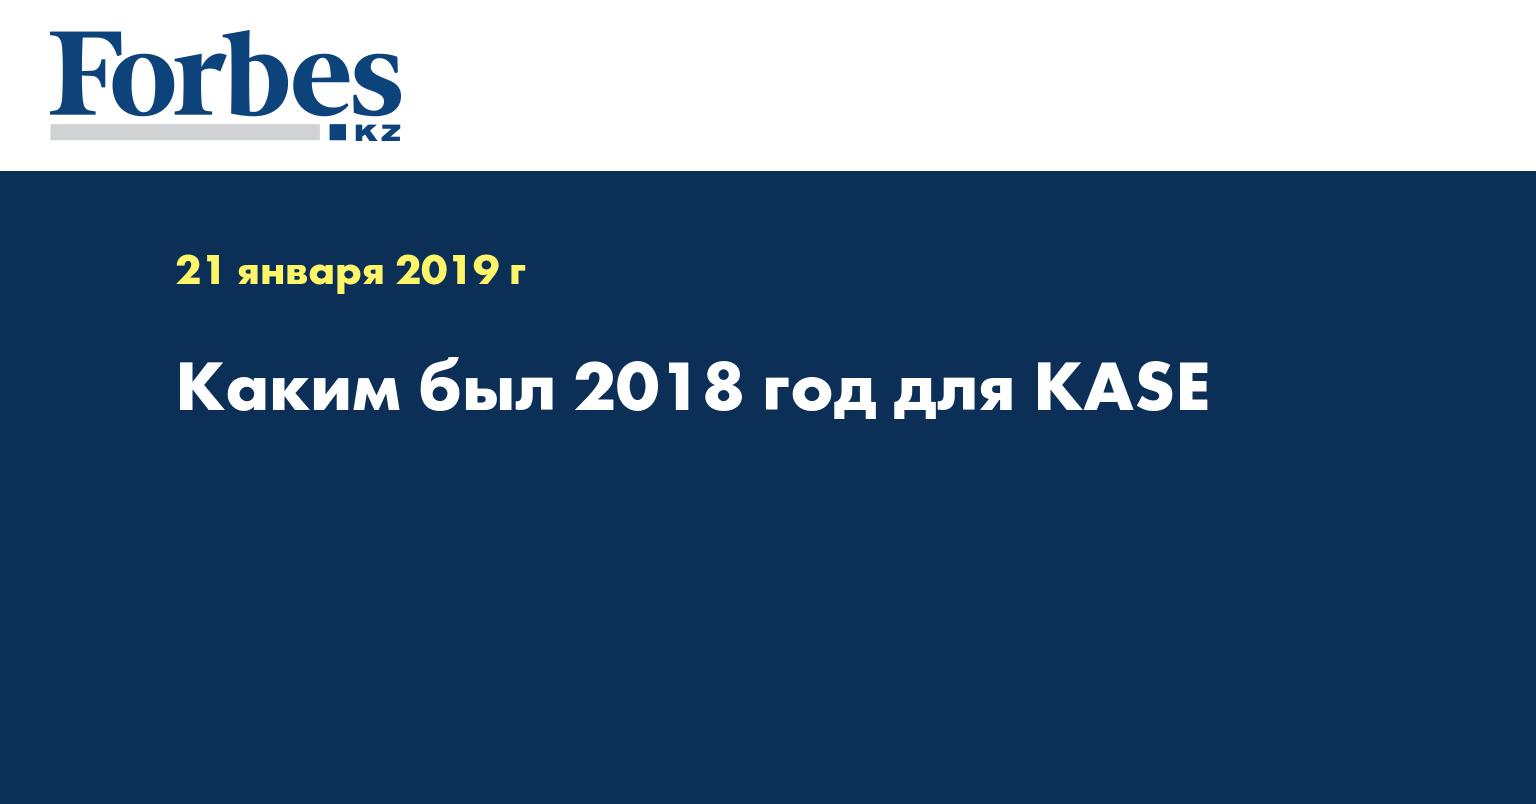 Каким был 2018 год для KASE